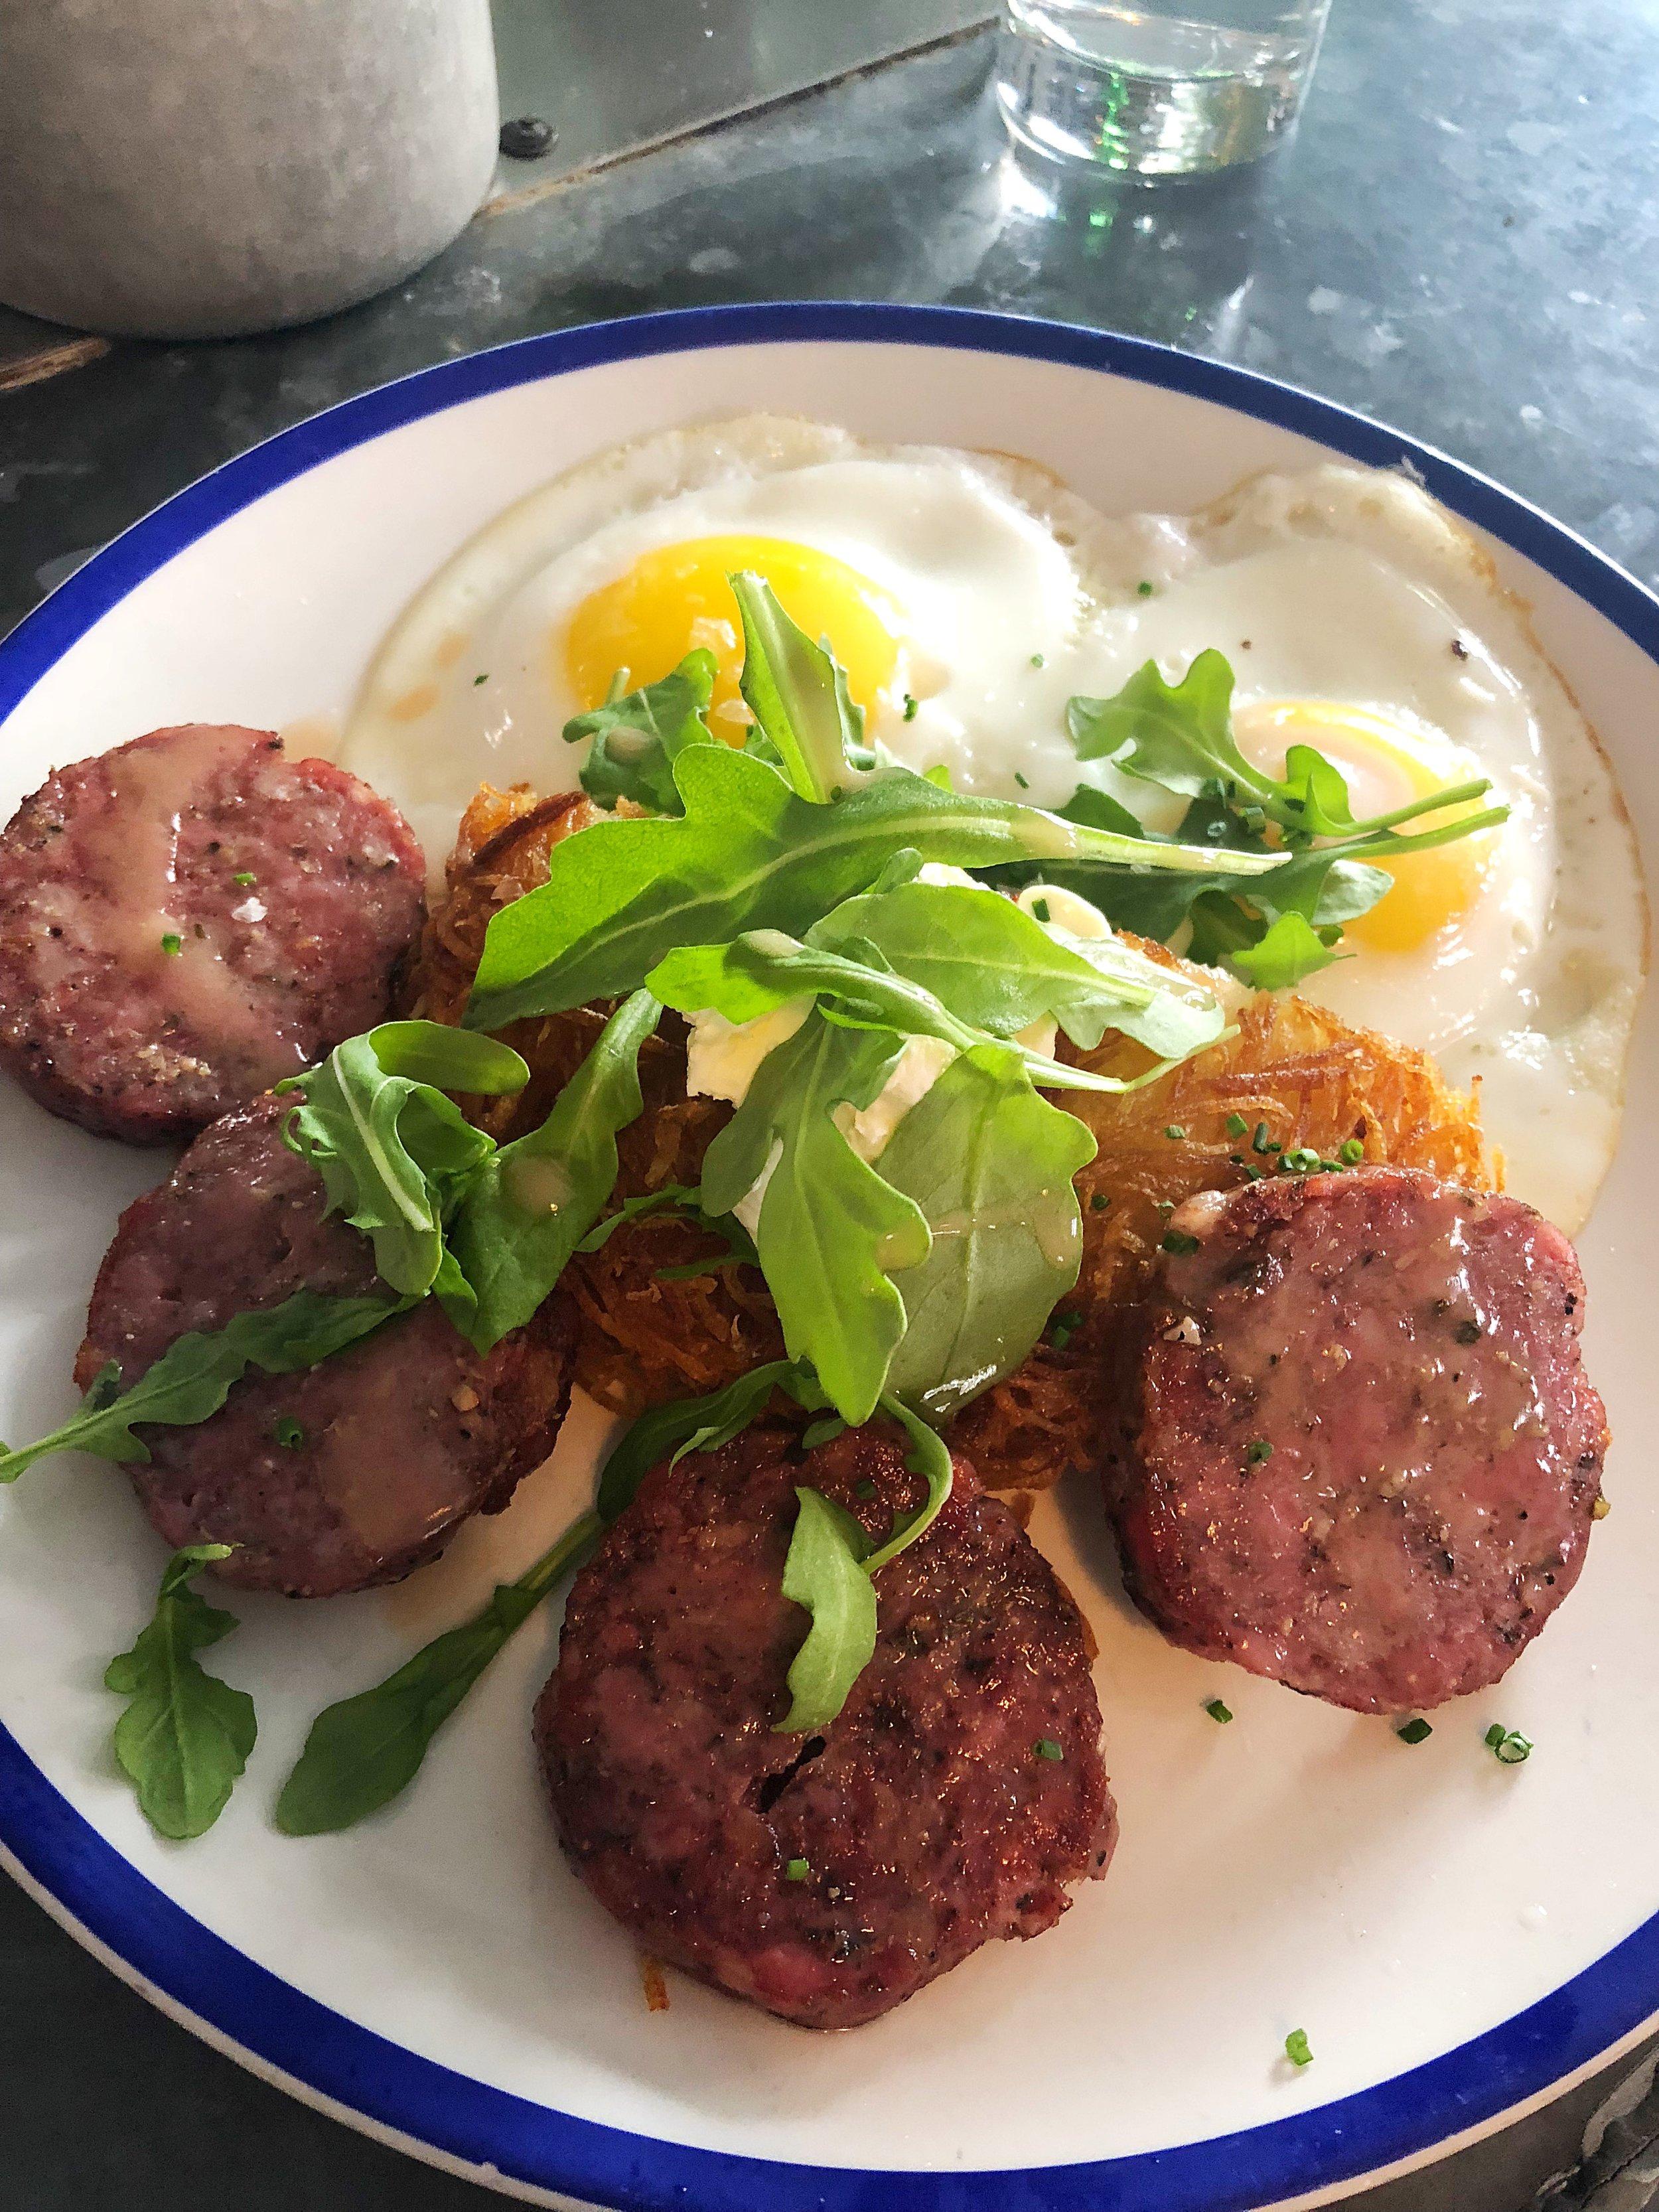 Saucisson a l'Ail: pork and garlic sausage, fried eggs, hashbrown, crème fraîche, arugula